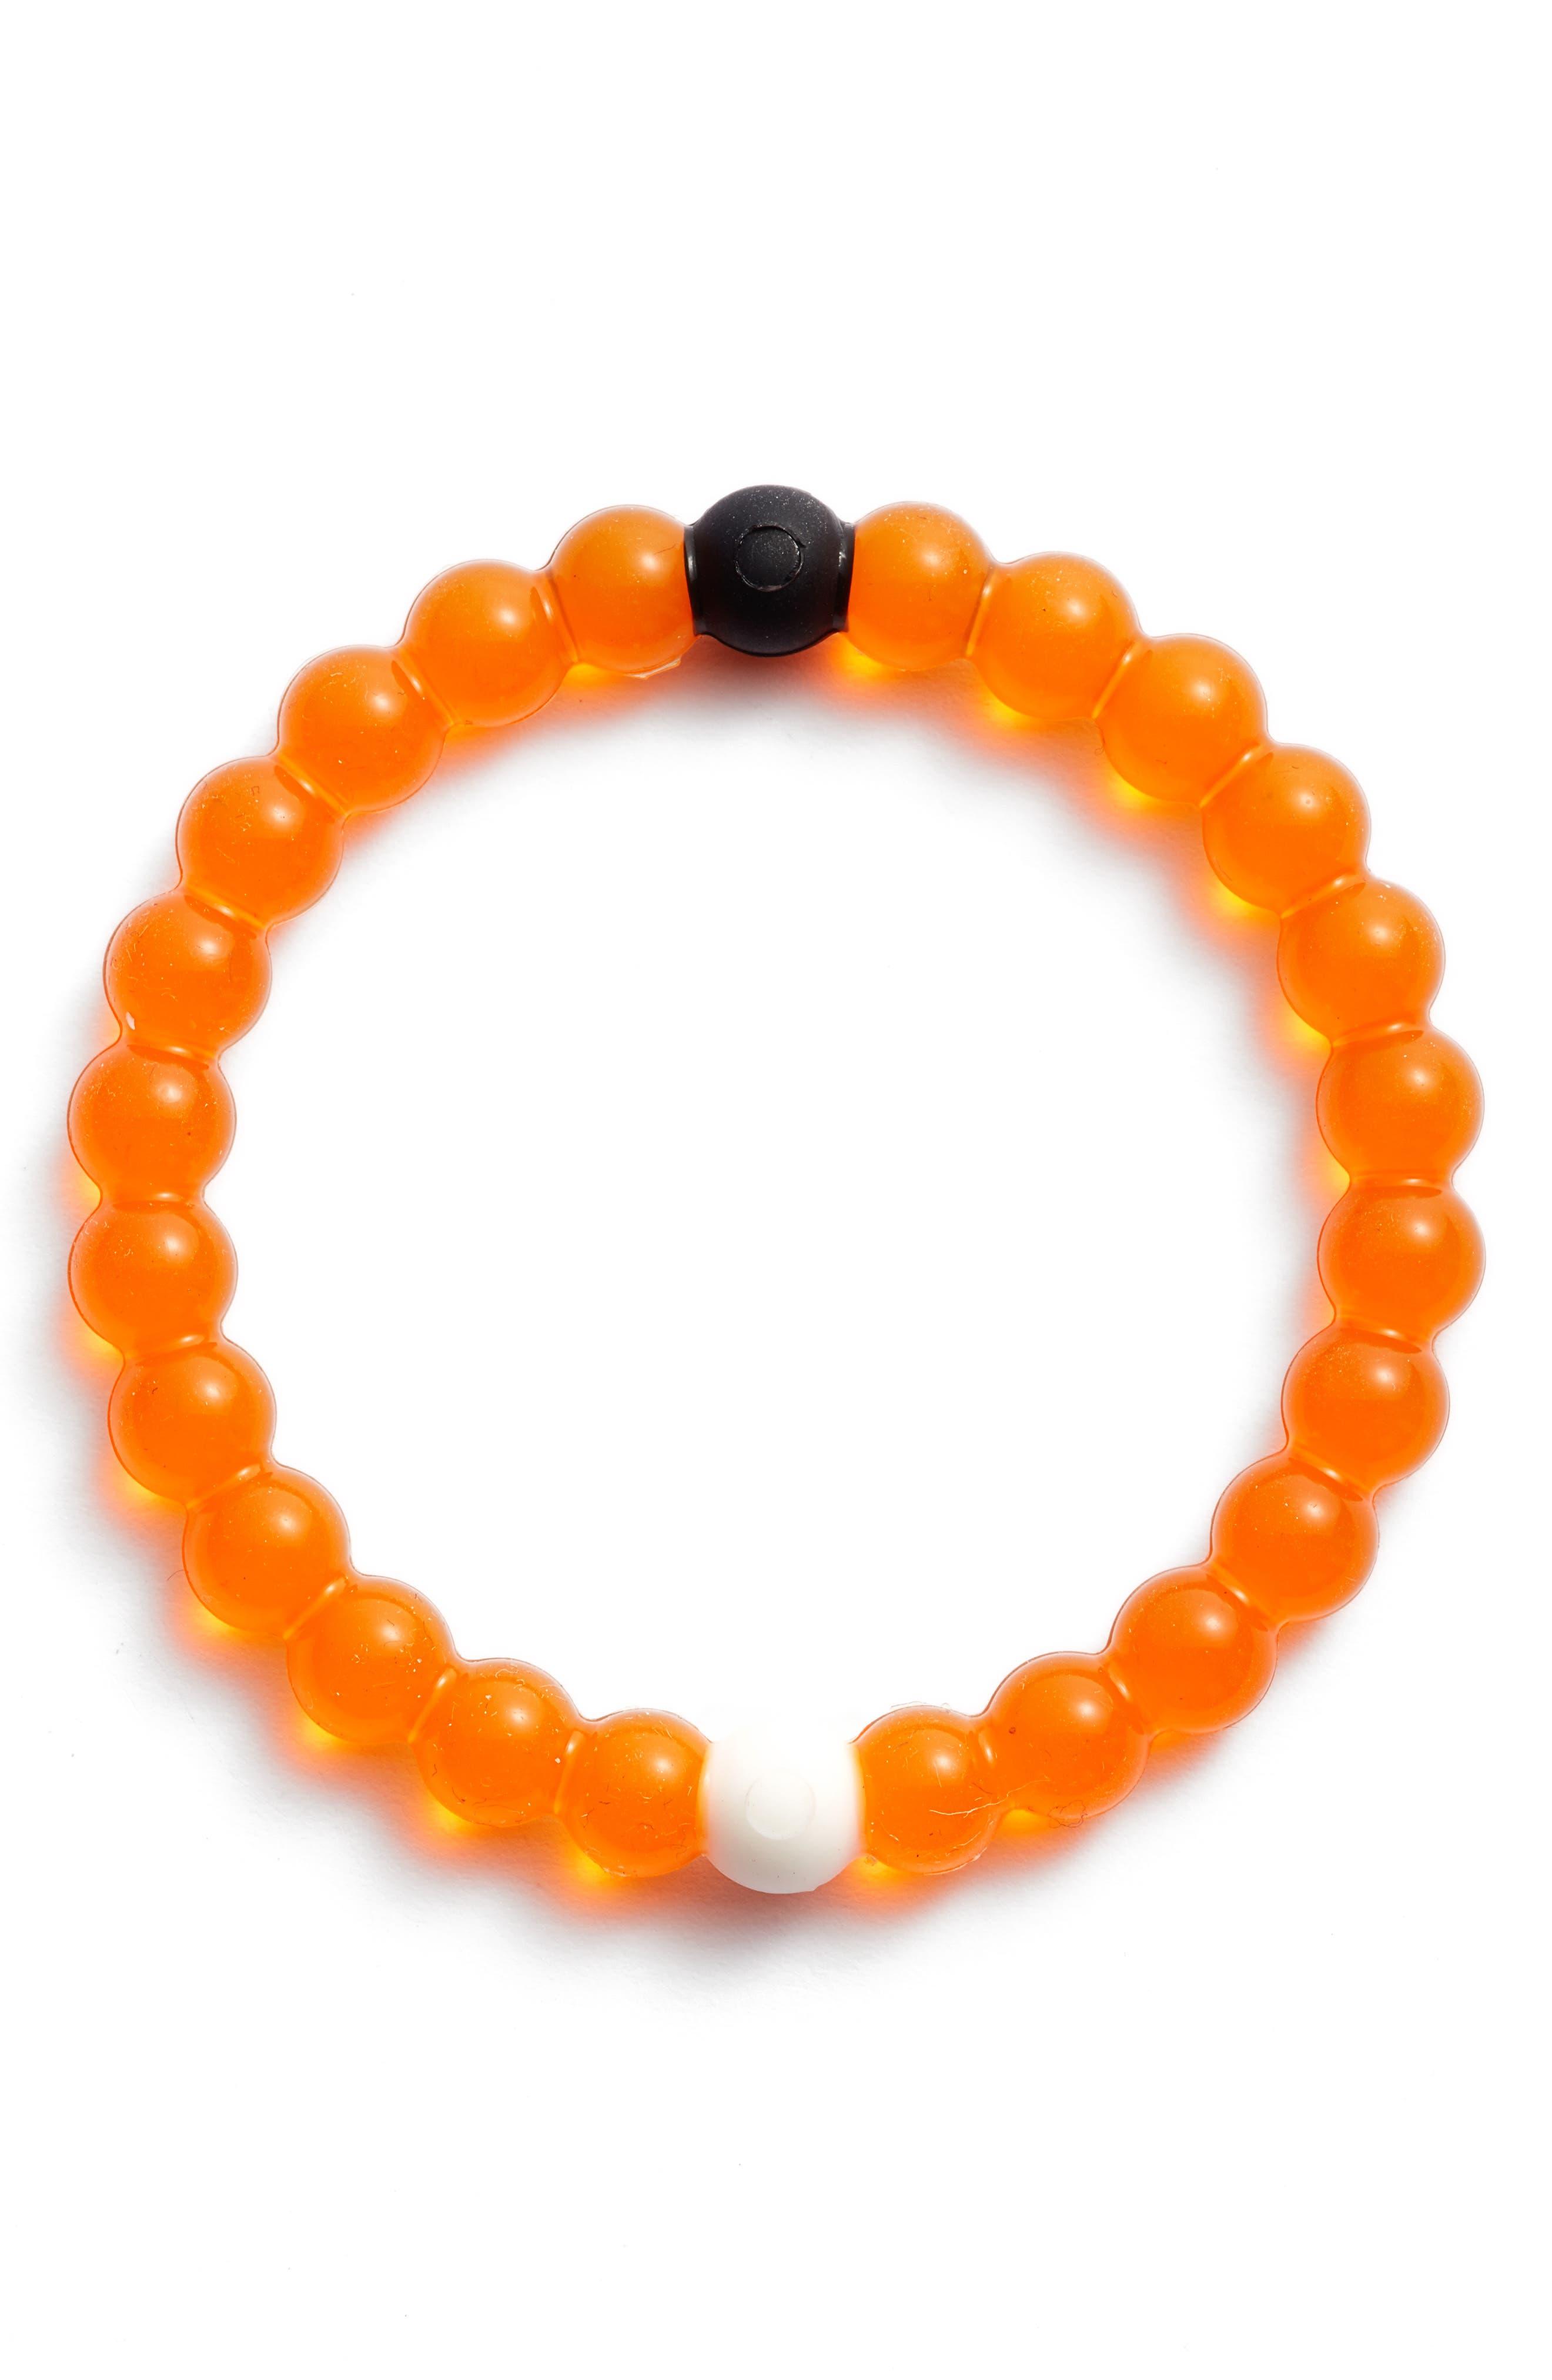 LOKAI, Mental Health Awareness Orange Bracelet, Main thumbnail 1, color, 800